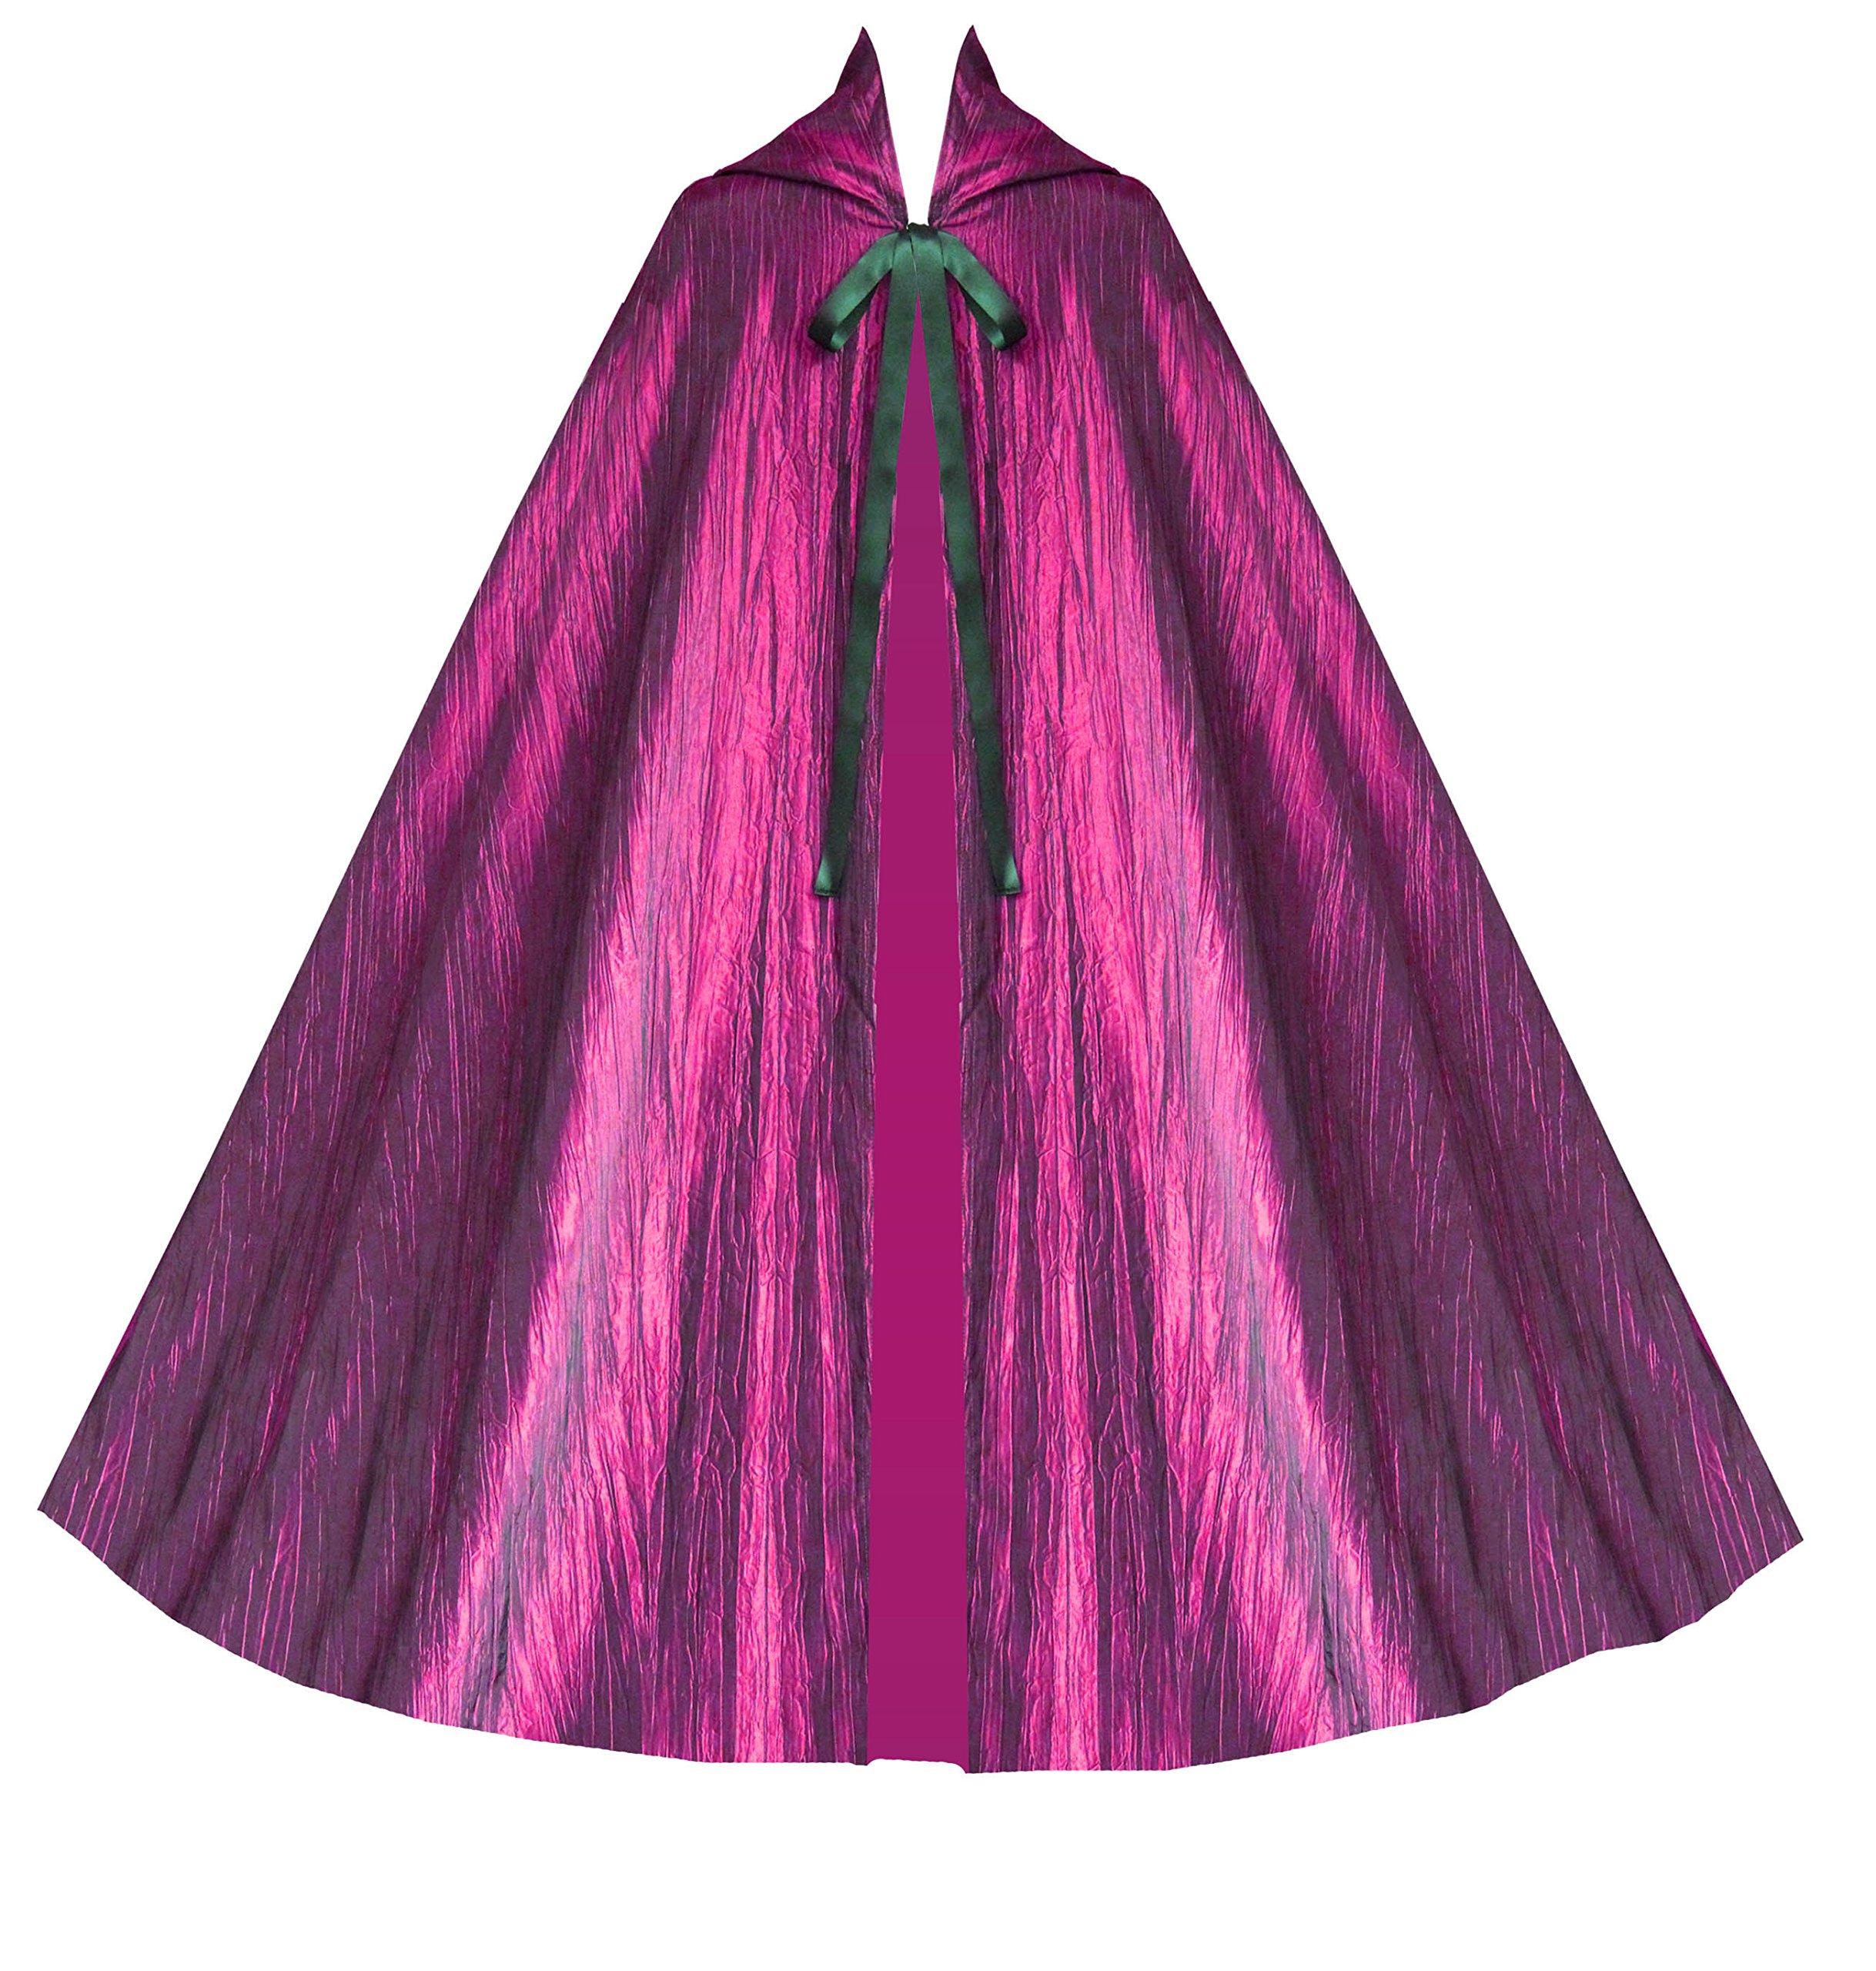 Cykxtees Historical Gothic Steampunk Victorian Hooded Renaissance Short Capelet Cloak 3